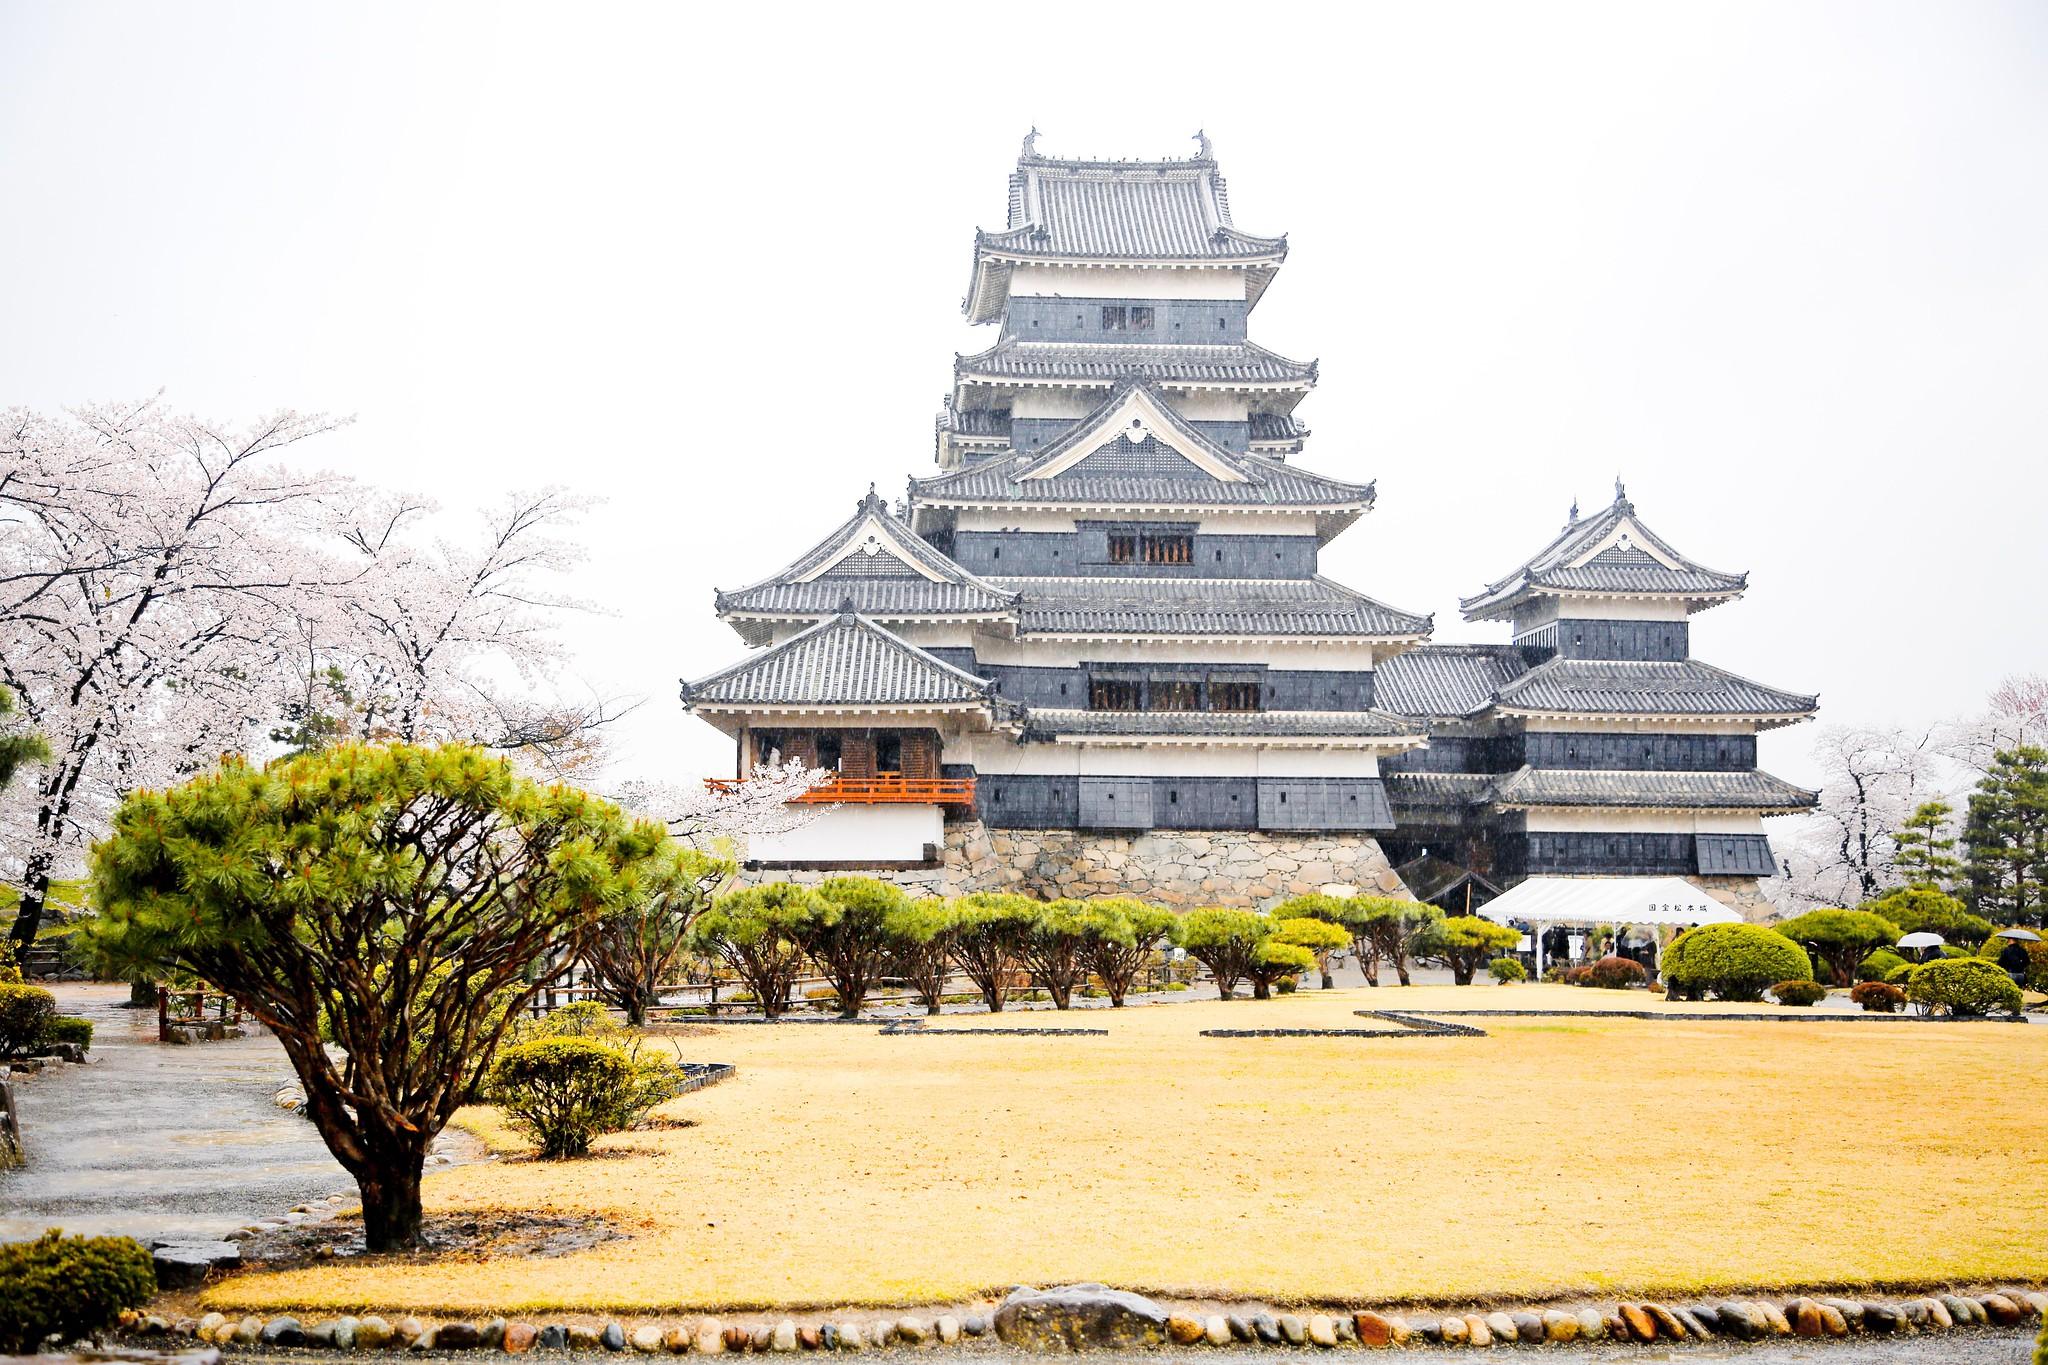 國寶松本城 Matsumoto Castle